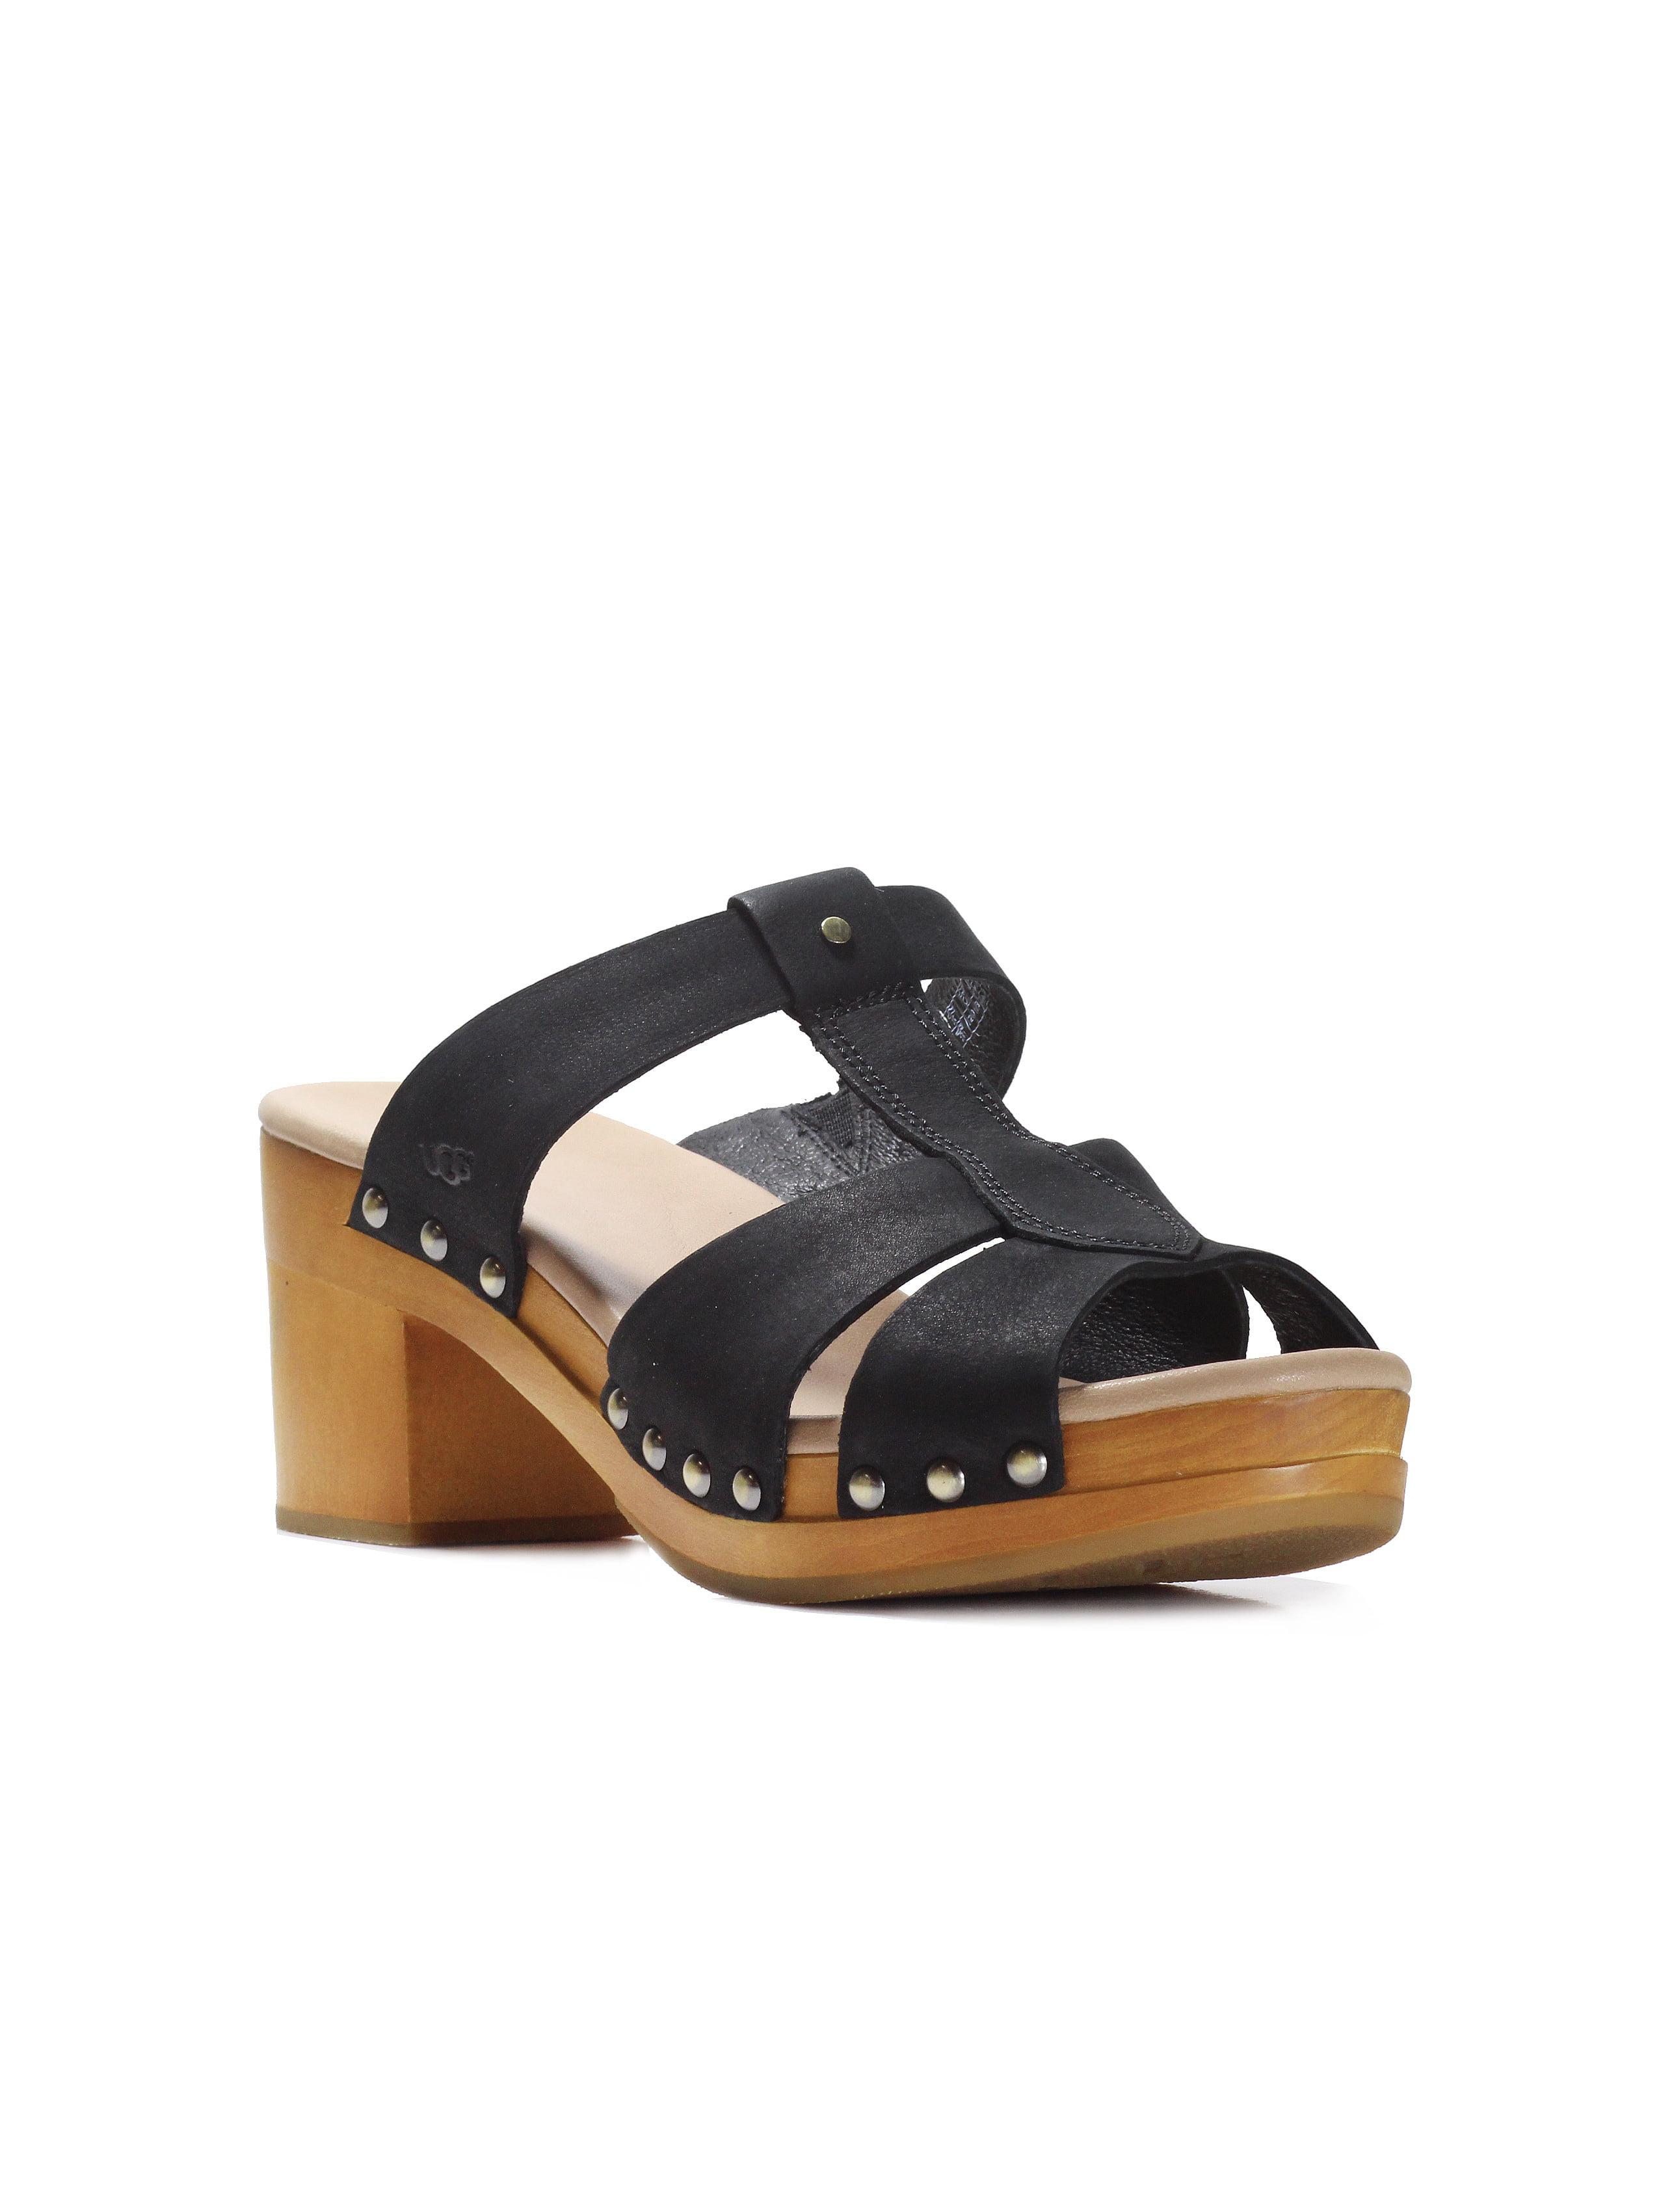 6b453778e5a UGG Women's Jennie Black Nubuck Sandal 9